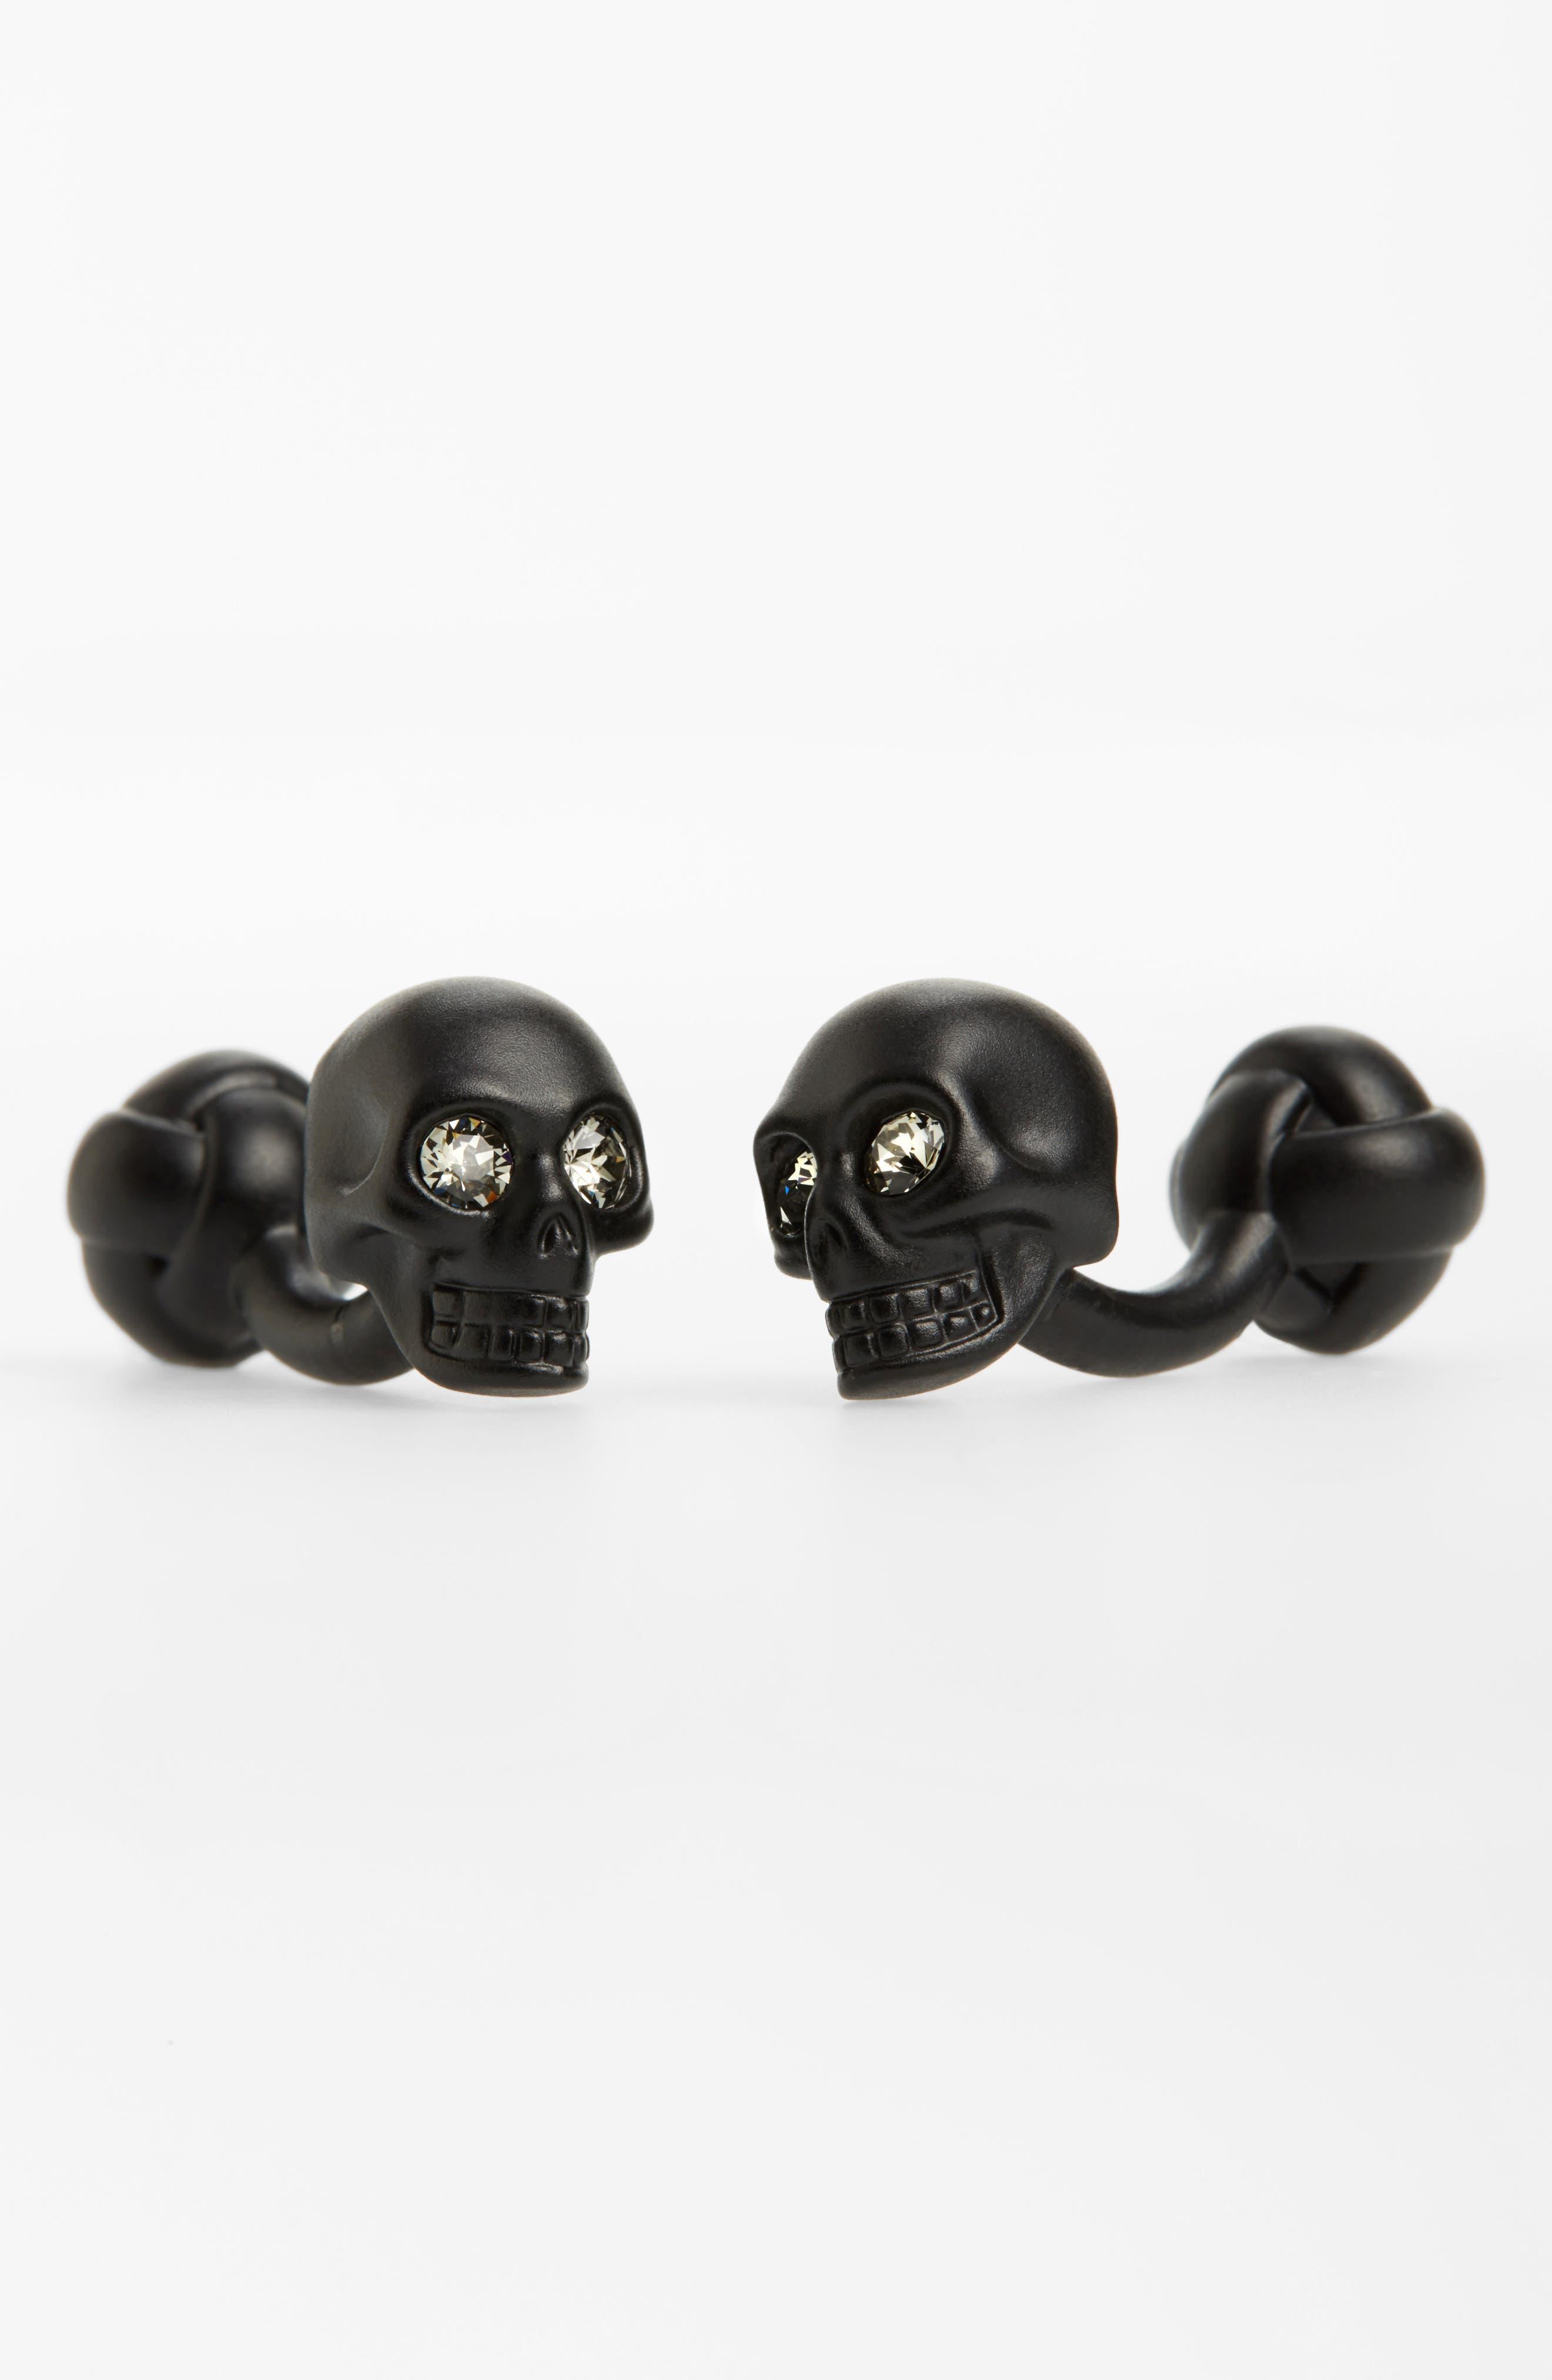 3D Skull Matte Brass Cuff Links,                         Main,                         color, Black/ Crystal